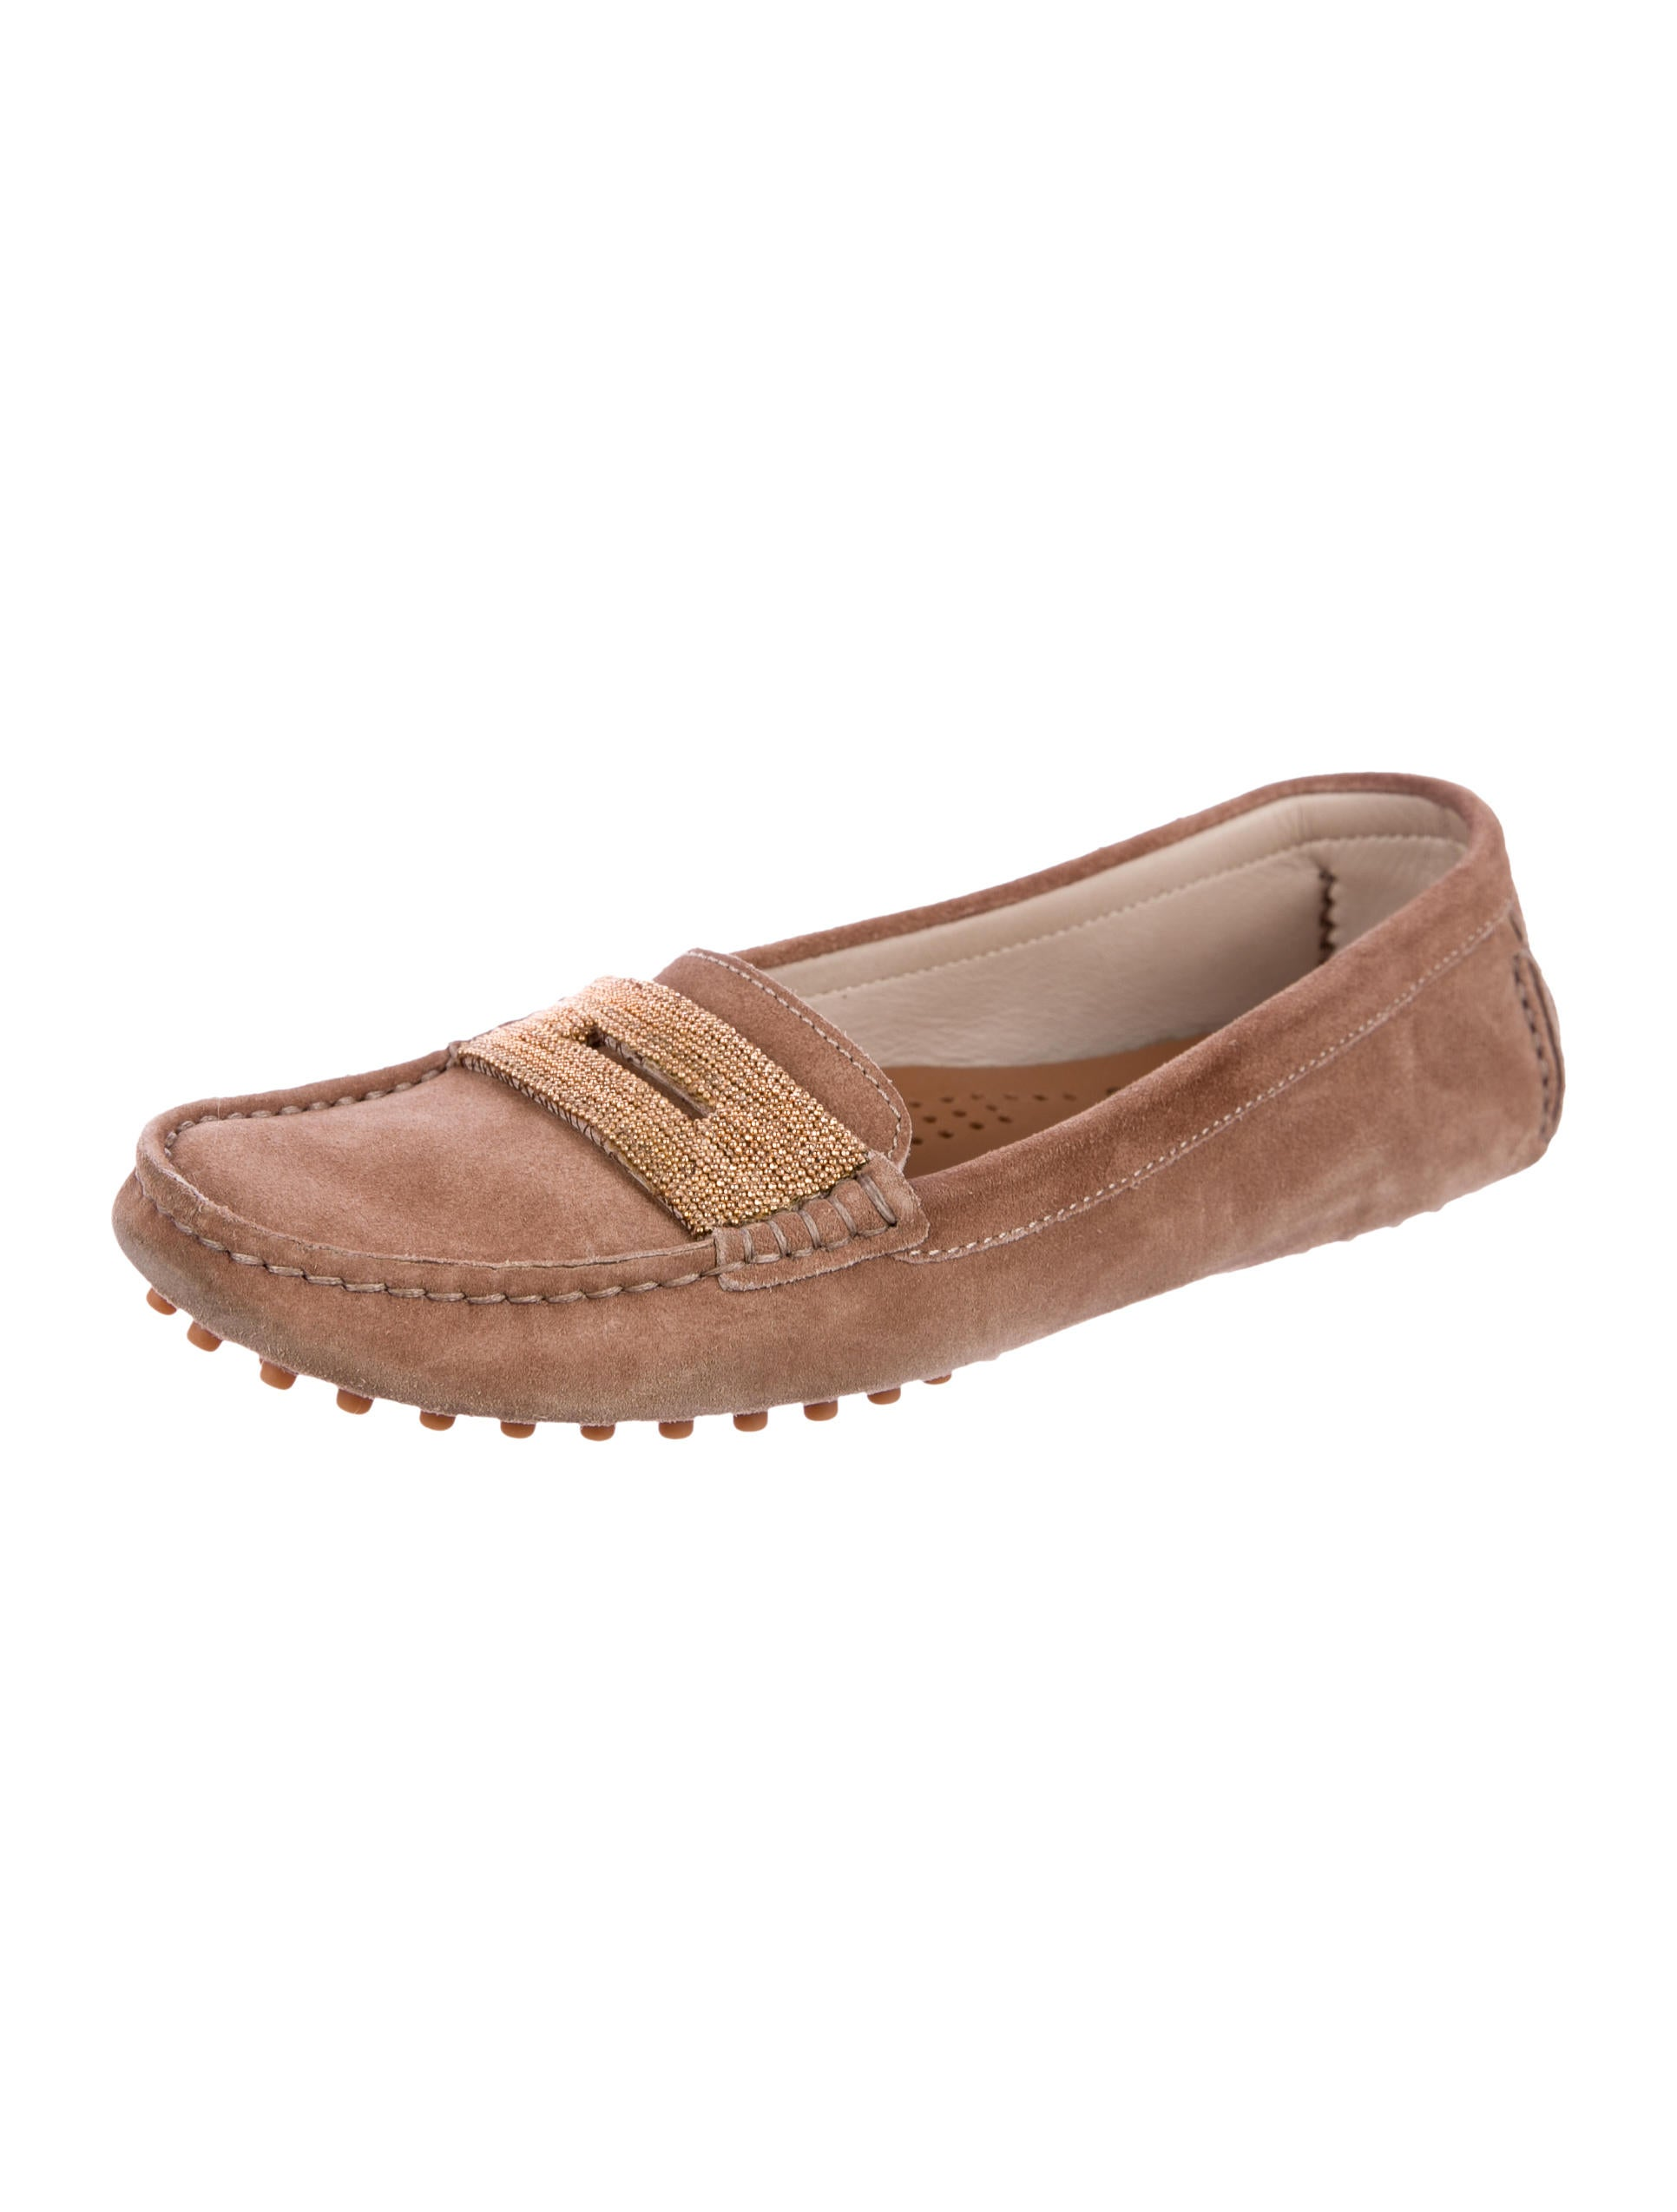 Brunello Cucinelli Monili Driving Loafers best sale sale online 18u7K